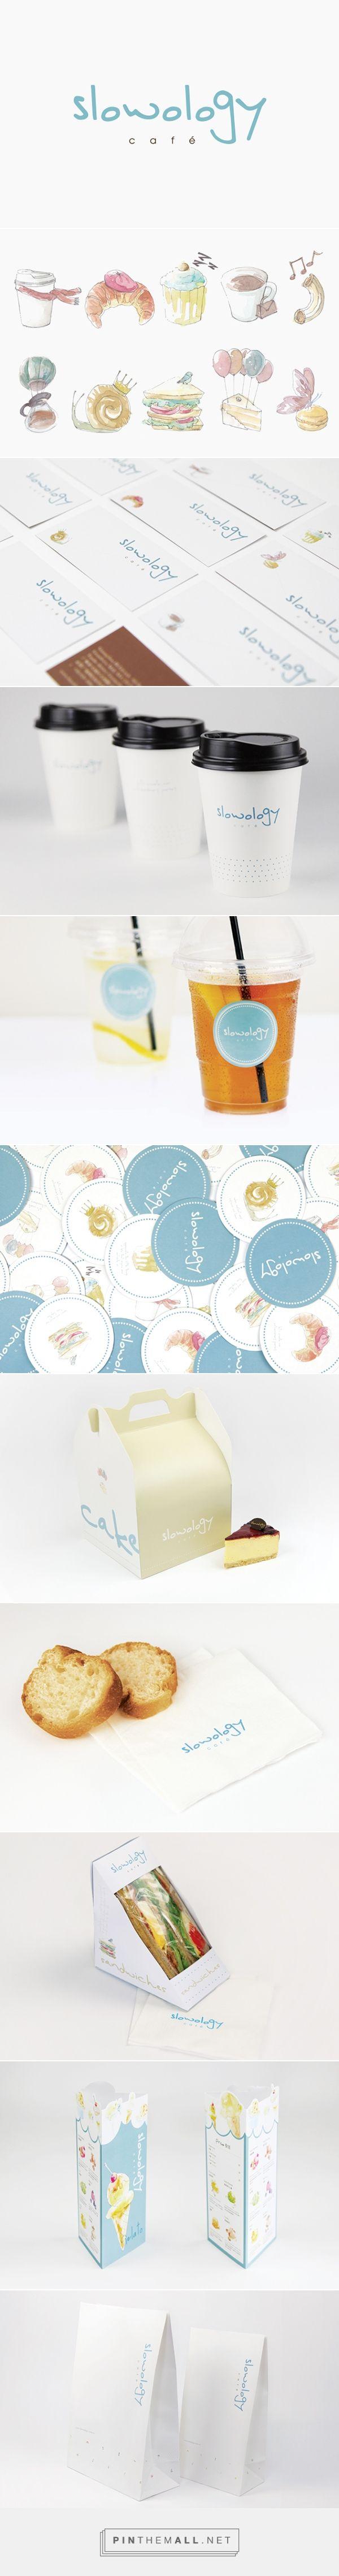 Slowology Café Branding Design on Behance | Fivestar Branding – Design and Branding Agency & Inspiration Gallery